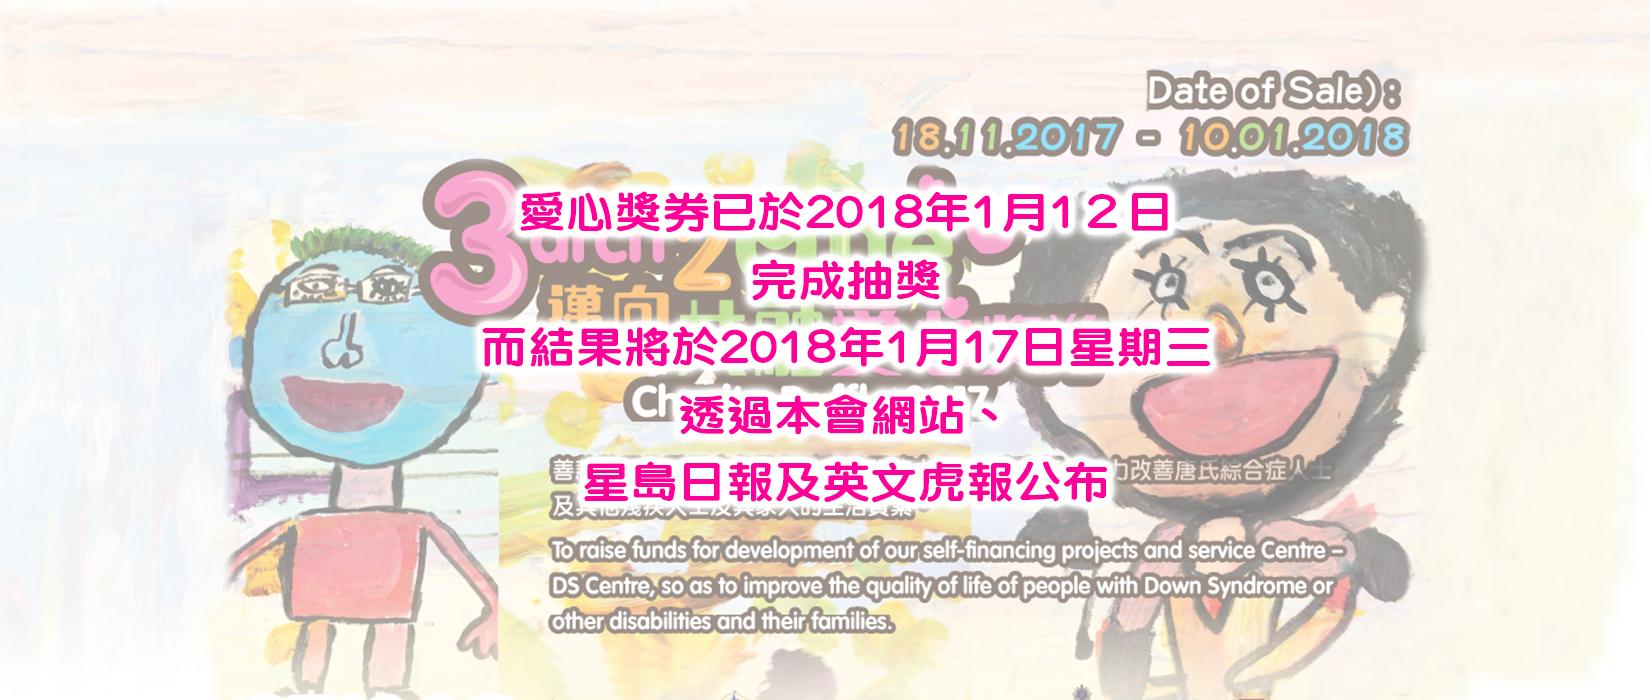 raffle-ticket-homepage-banner-result